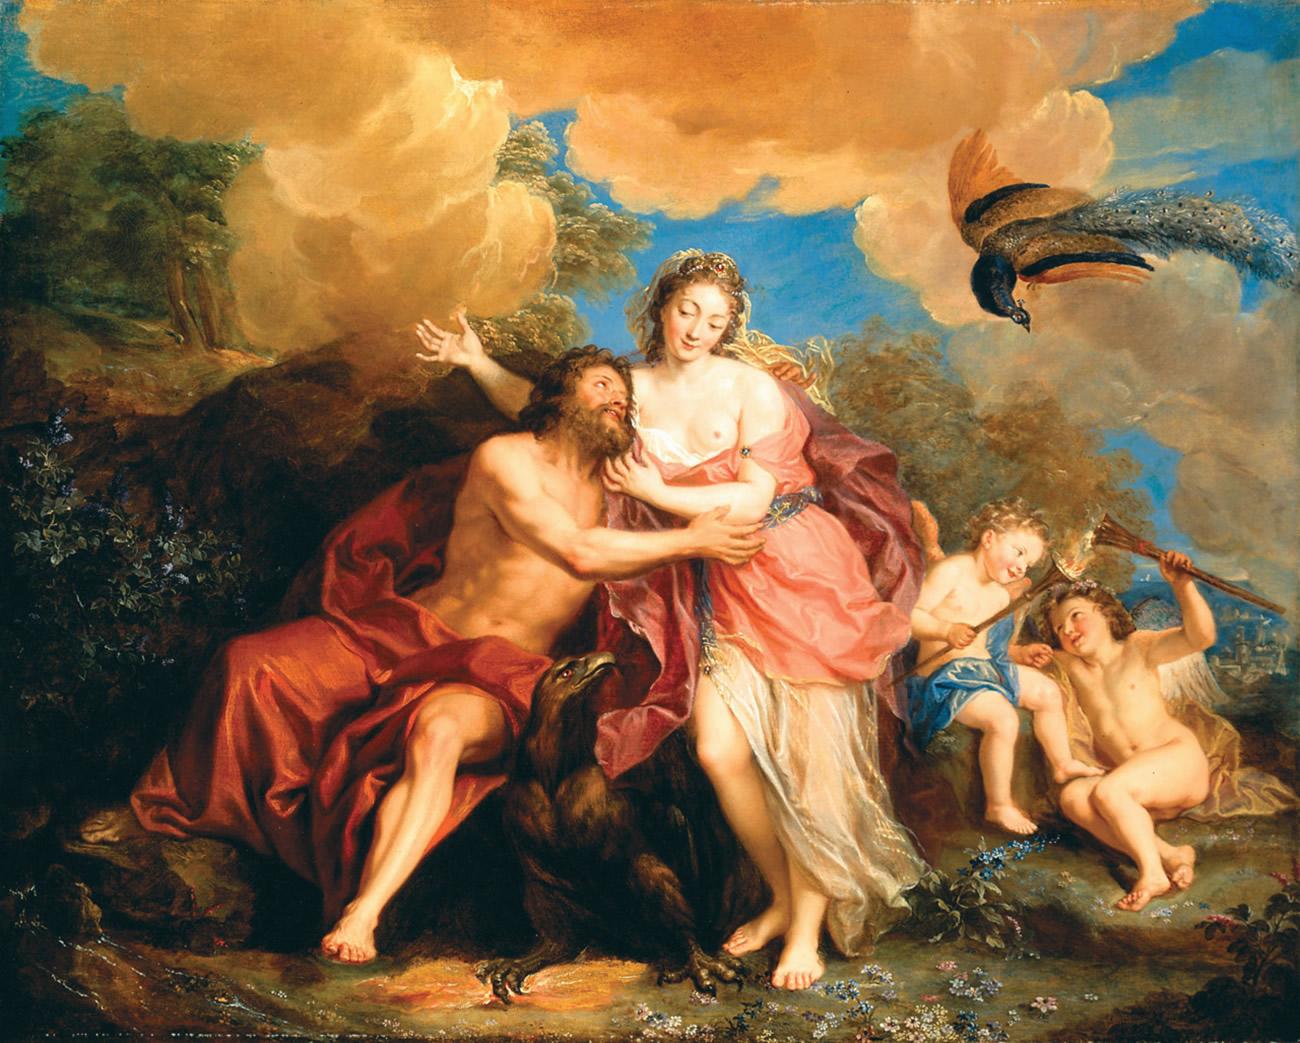 Een frisse blik op de Griekse mythologie